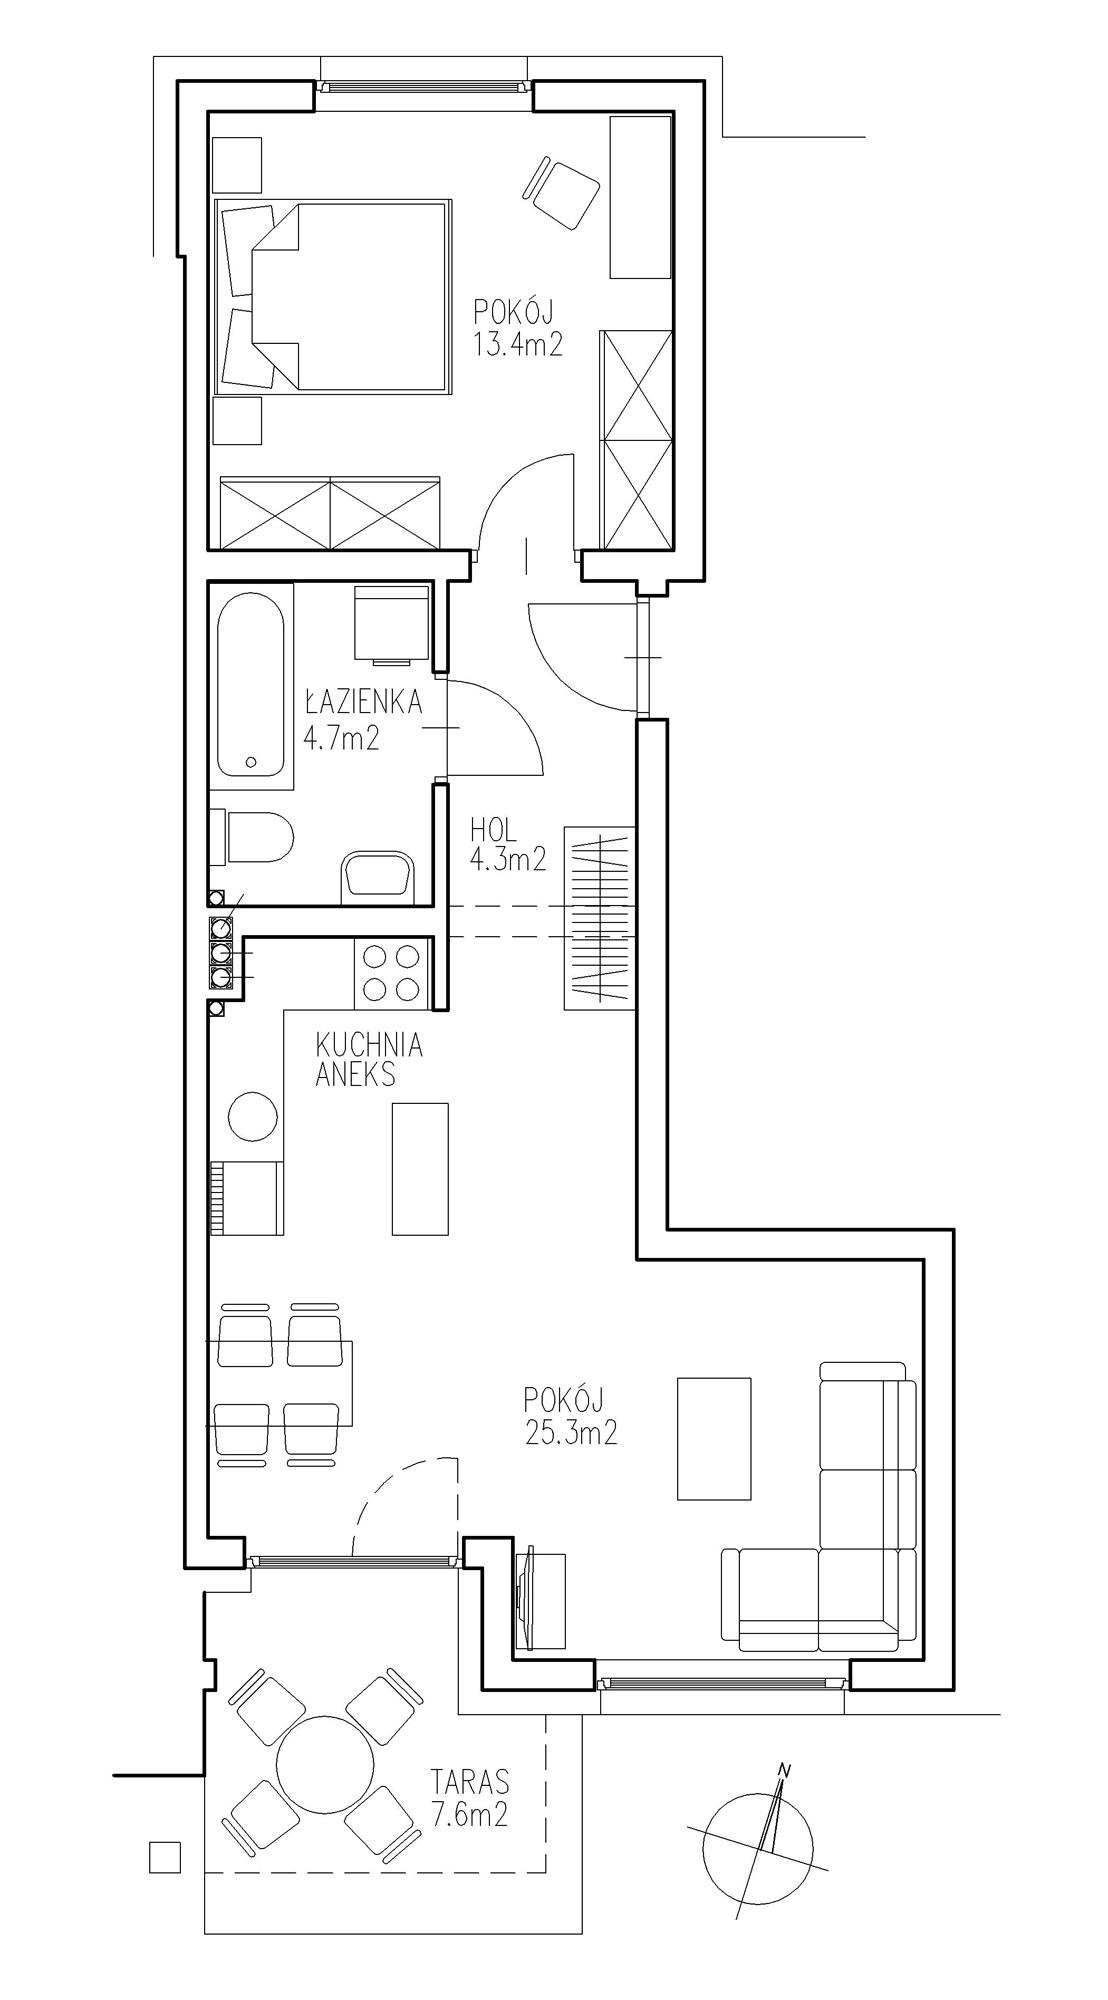 KTK Deweloper - Ełk - ul. Ogrodowa - Blok nr 2 - Mieszkanie nr 8